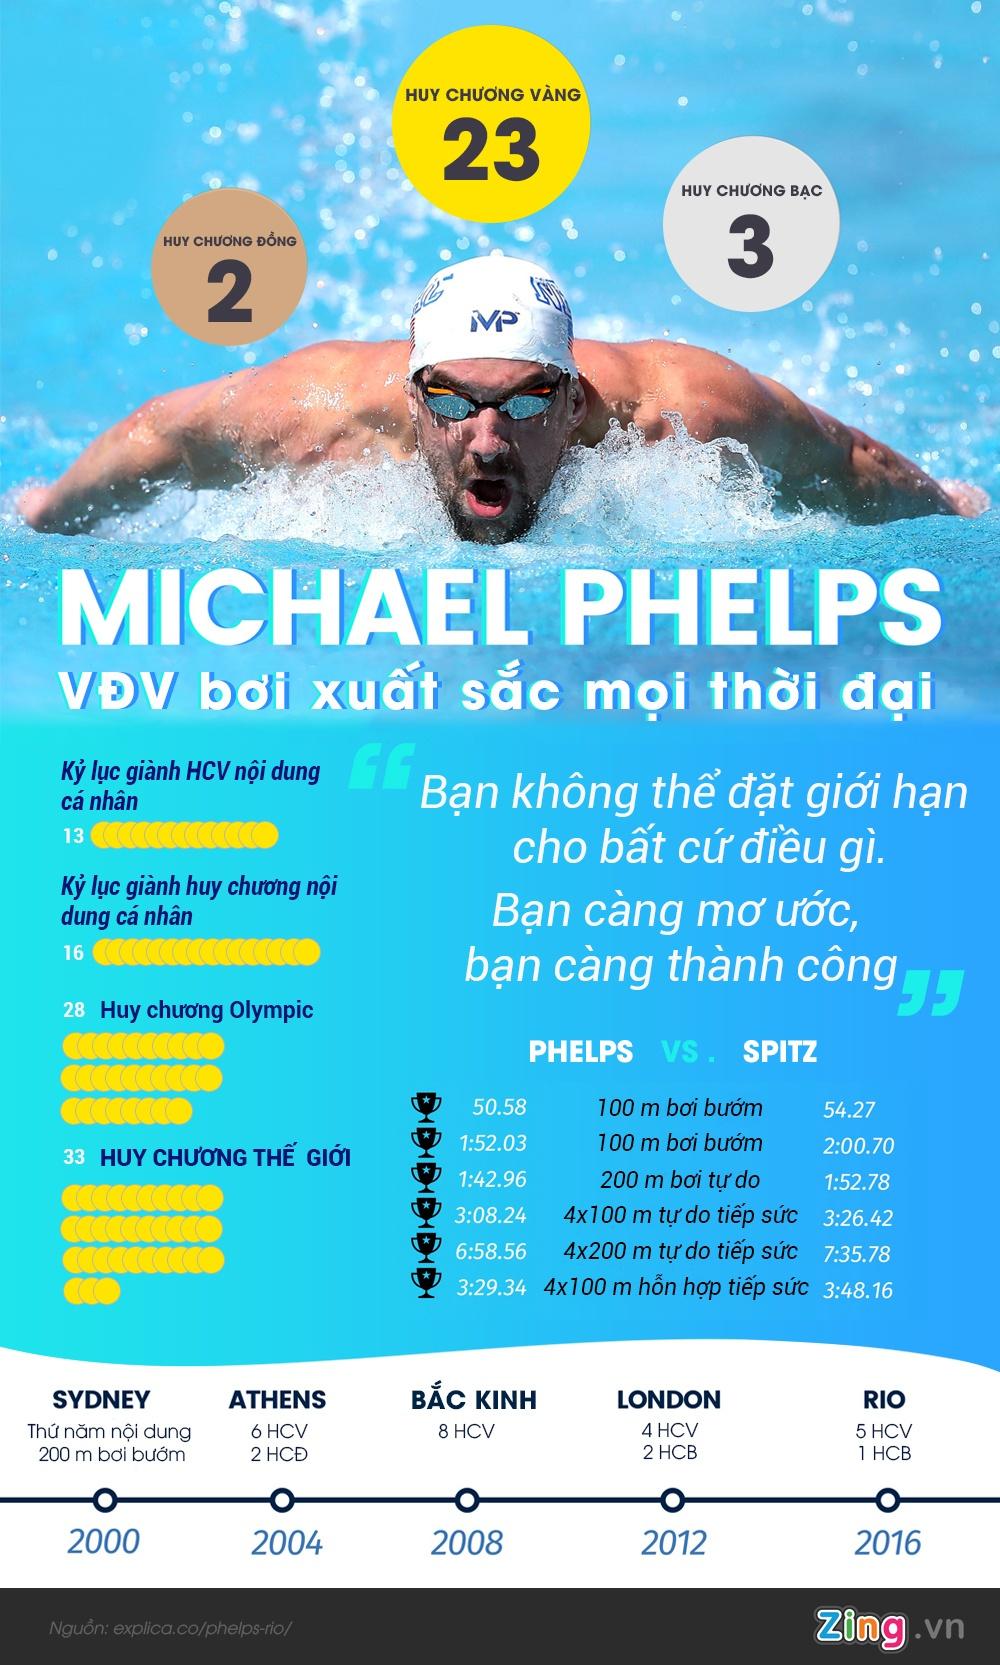 Michael Phelps xuat sac moi thoi dai anh 1